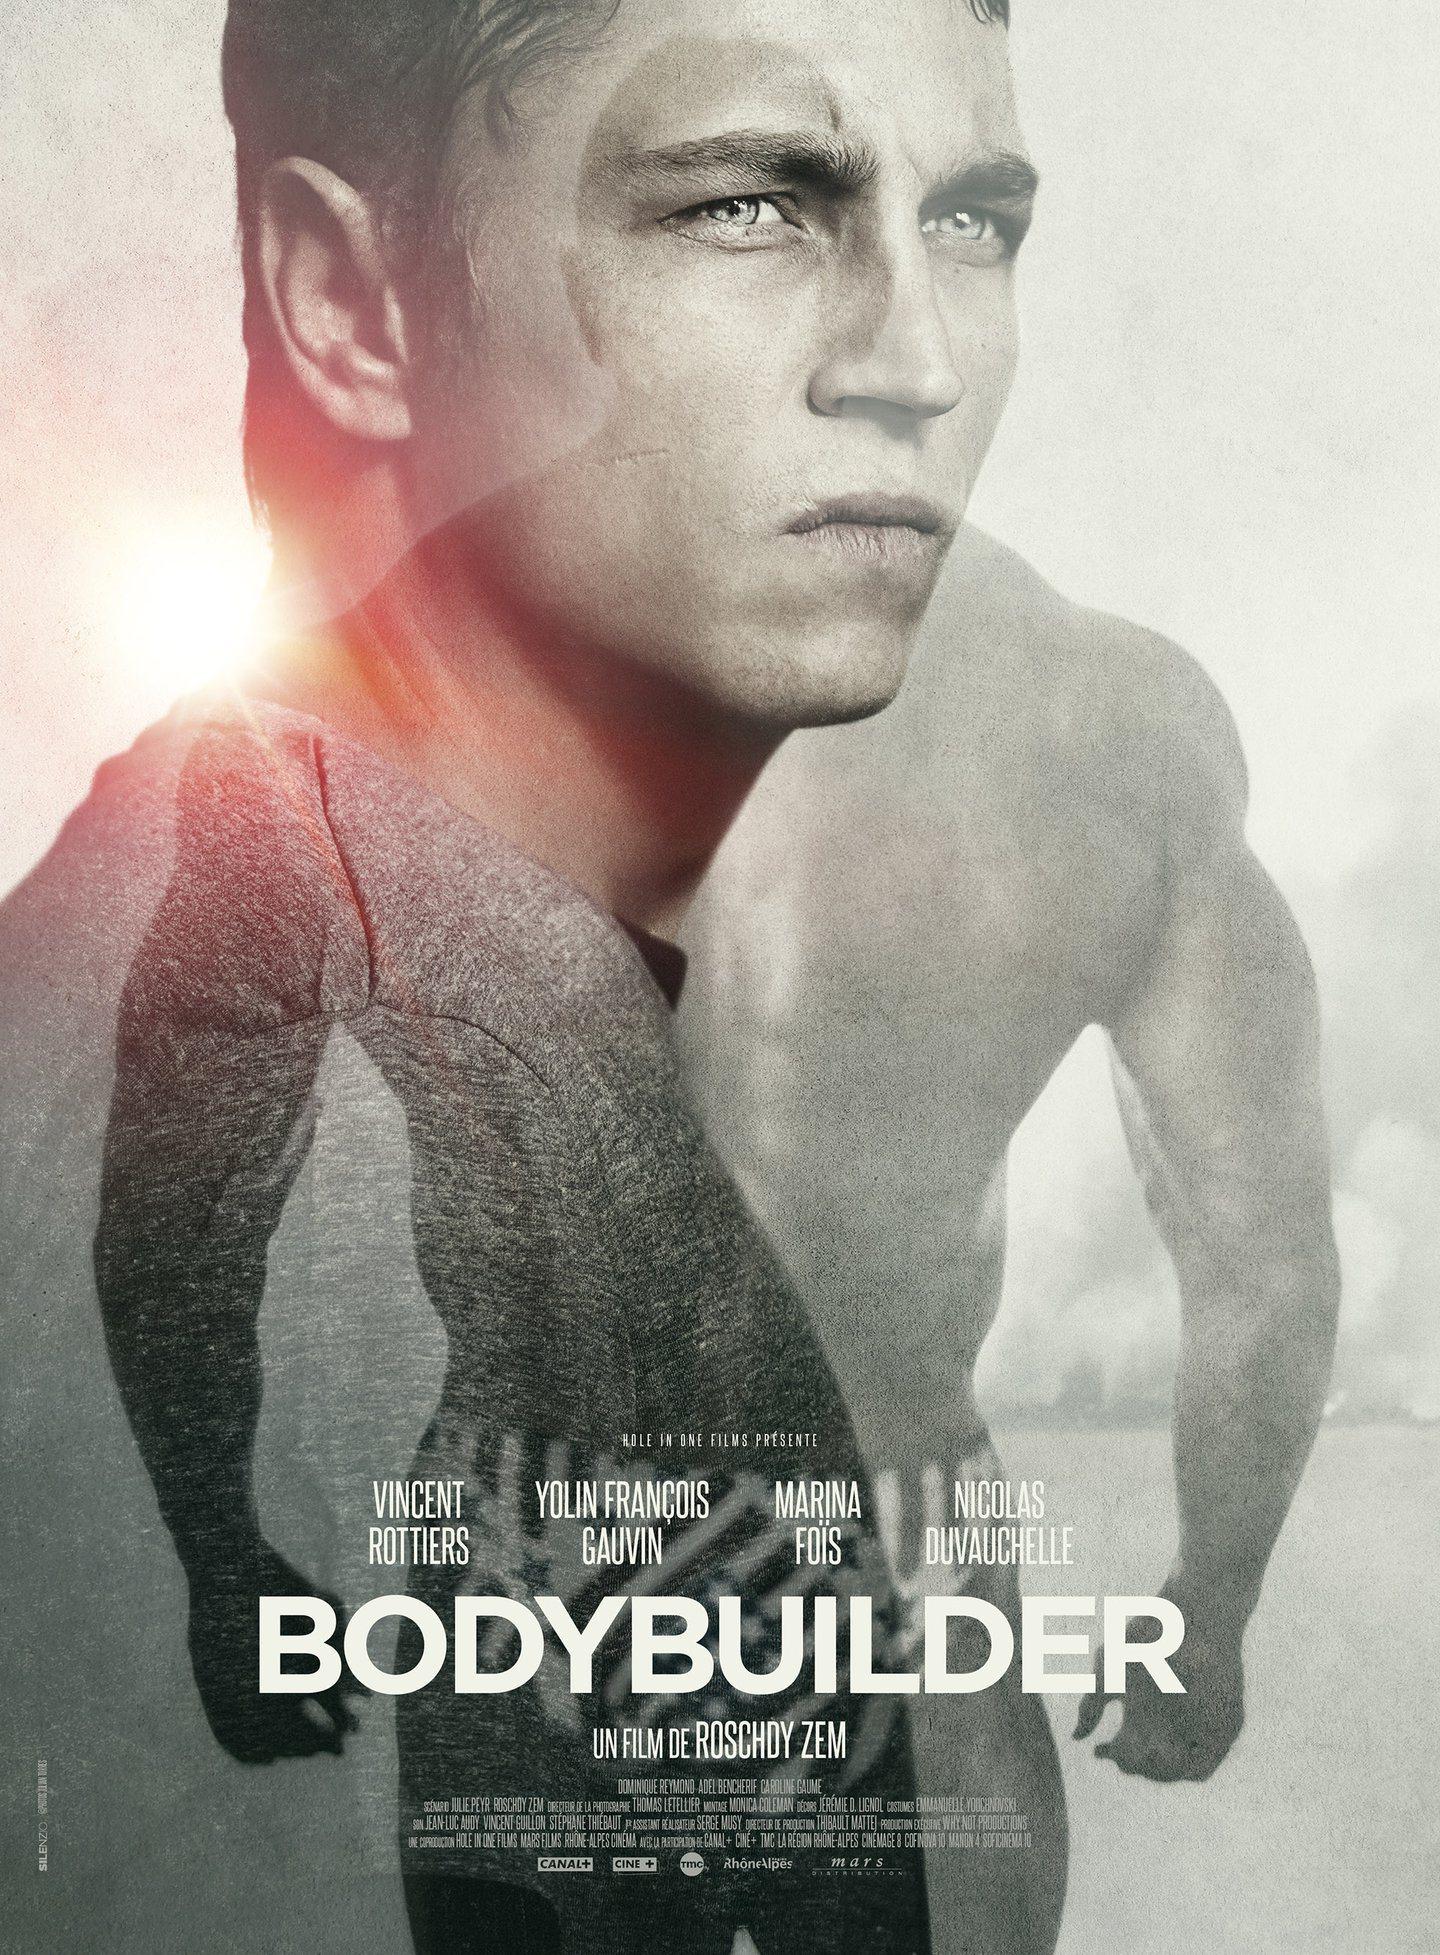 Bodybuilder de Roschdy Zem : Culture Club (CRITIQUE)